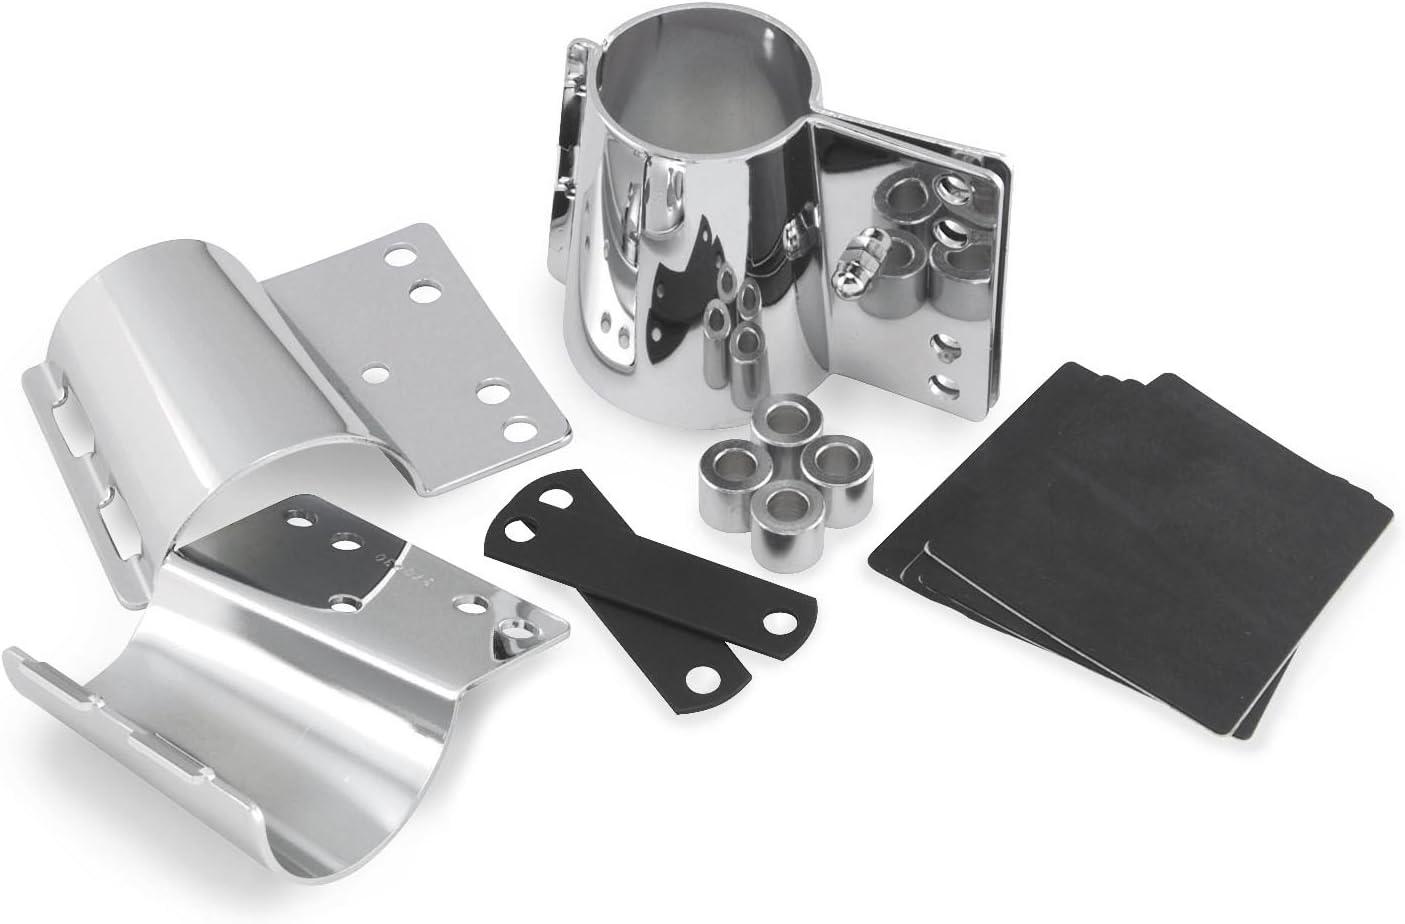 National Cycle KIT-CJE Windshield Mounting Kit